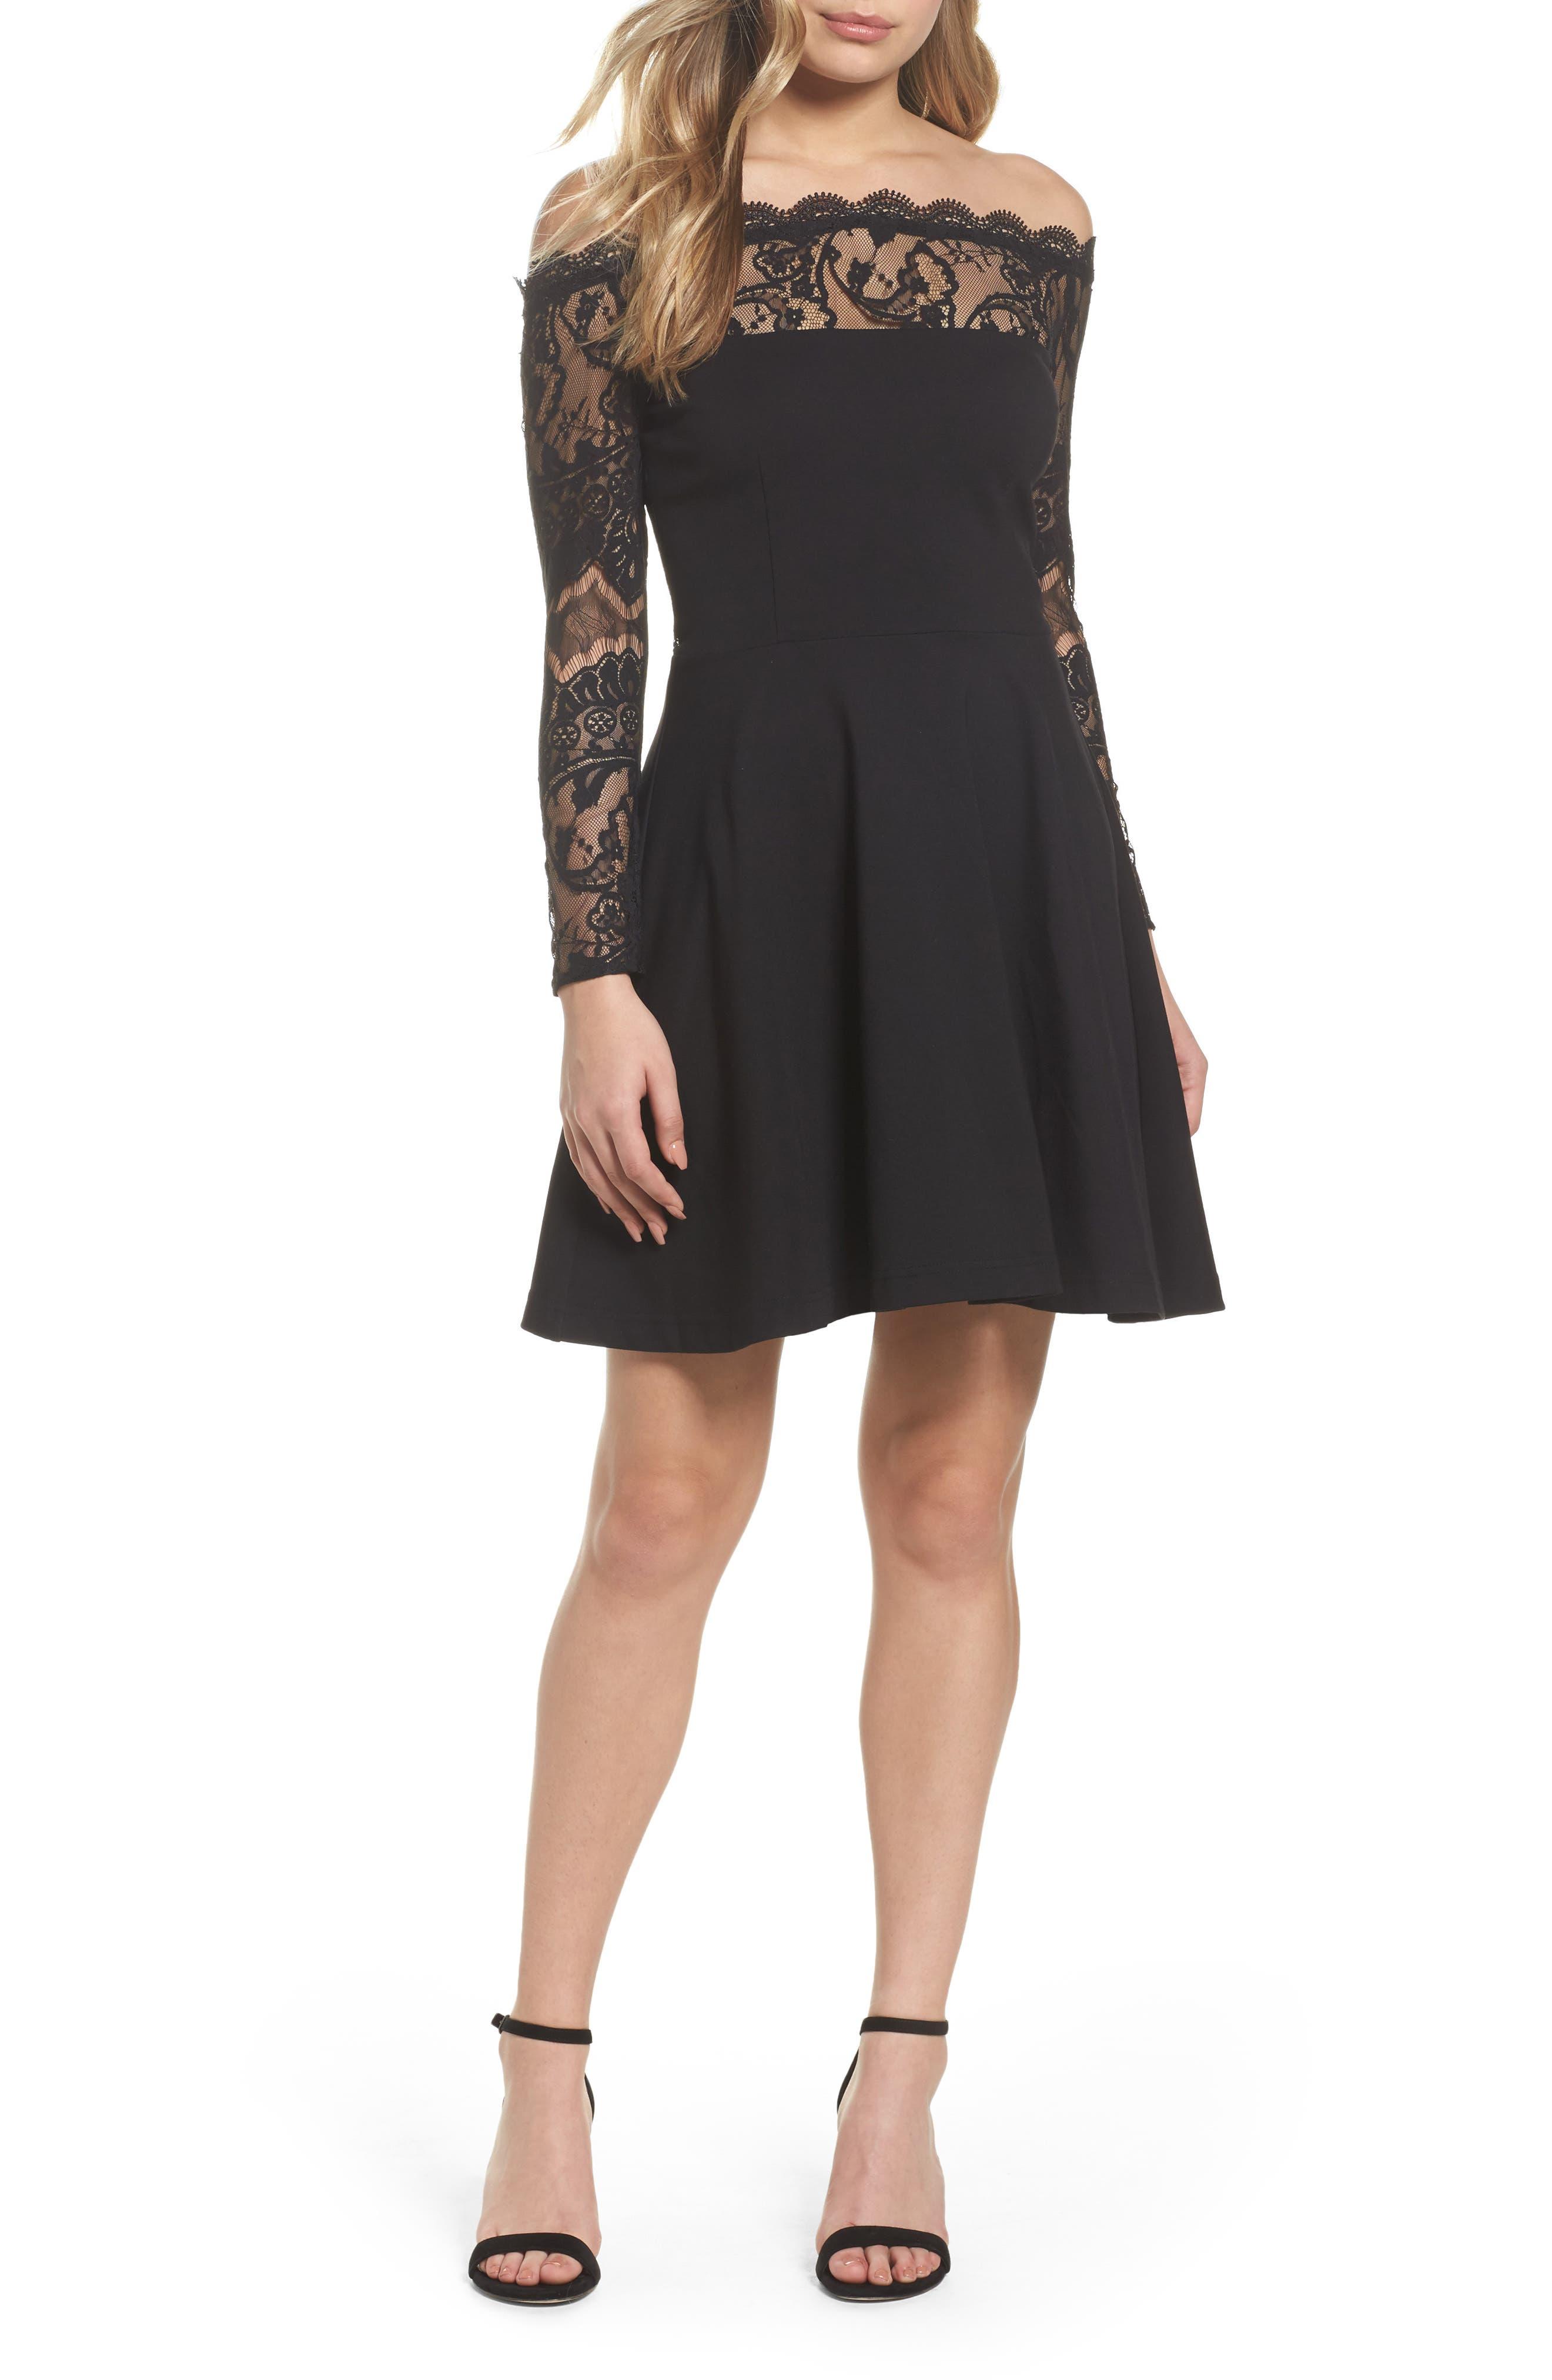 BB Dakota Dennett Off the Shoulder Lace Dress